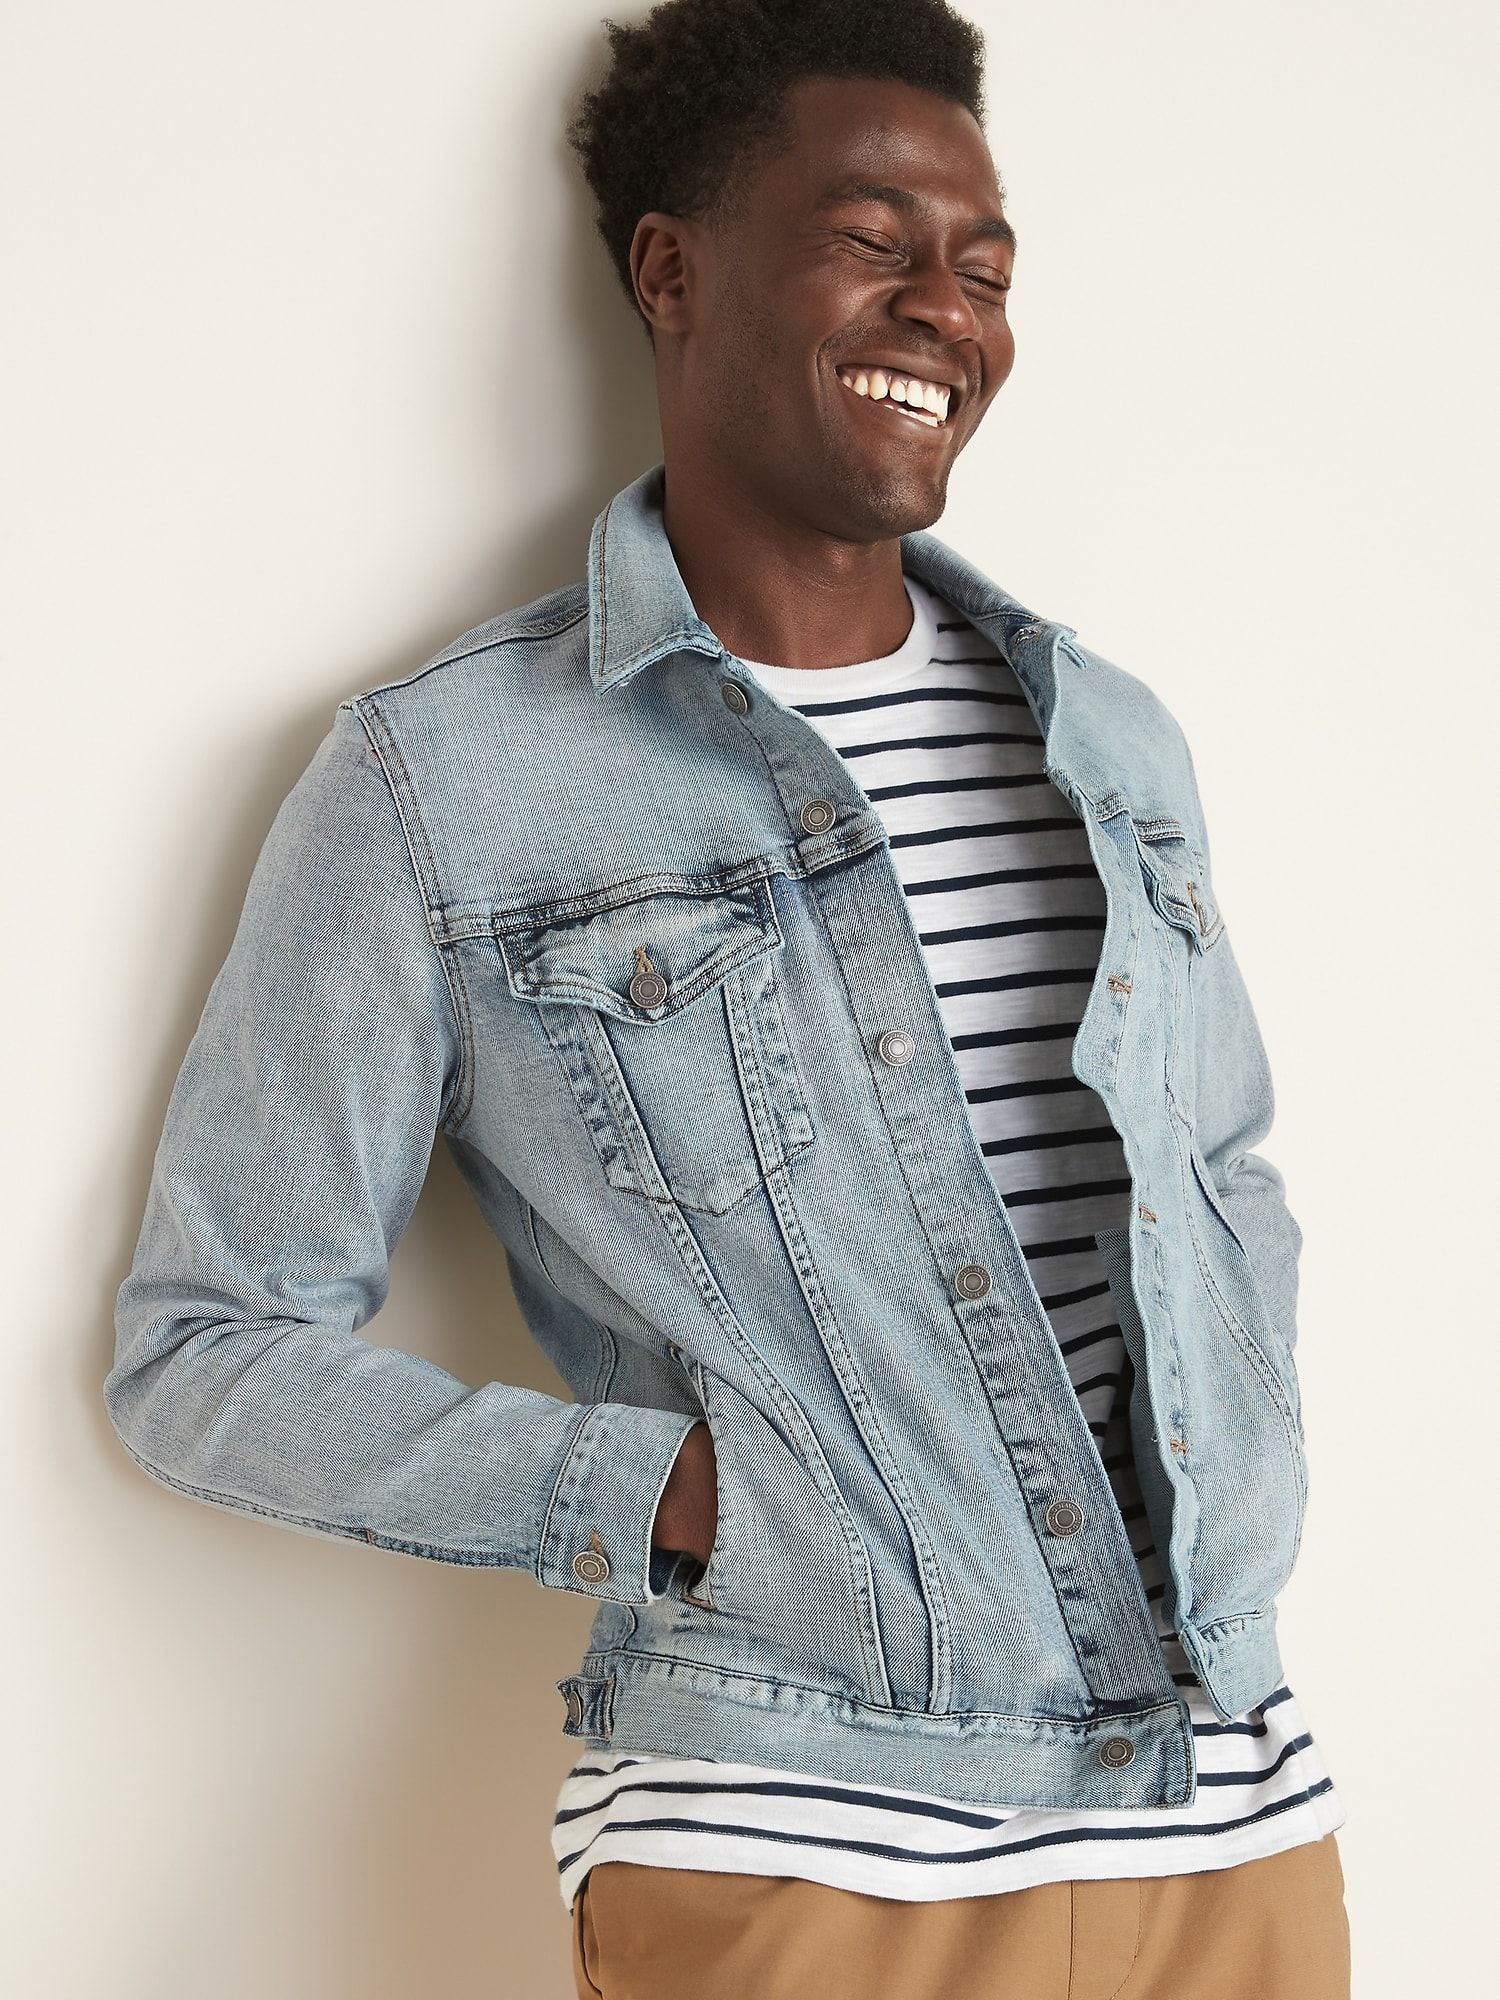 Built In Flex Light Wash Jean Jacket For Men Light Wash Jean Jacket Light Wash Jeans Mens Jackets [ 2000 x 1500 Pixel ]